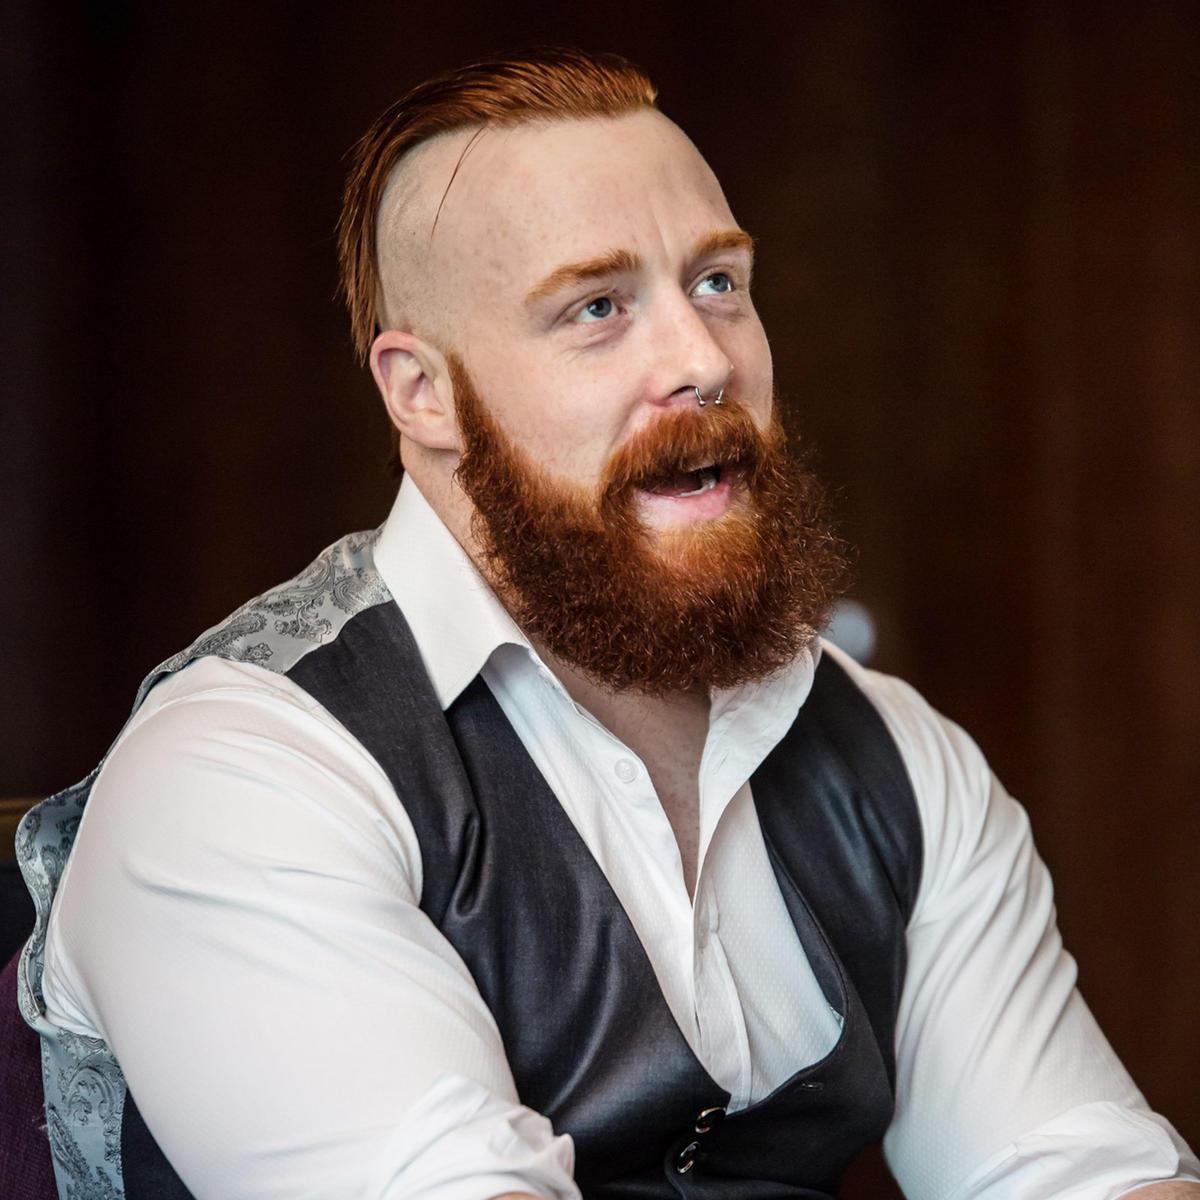 sheamus wwe beard